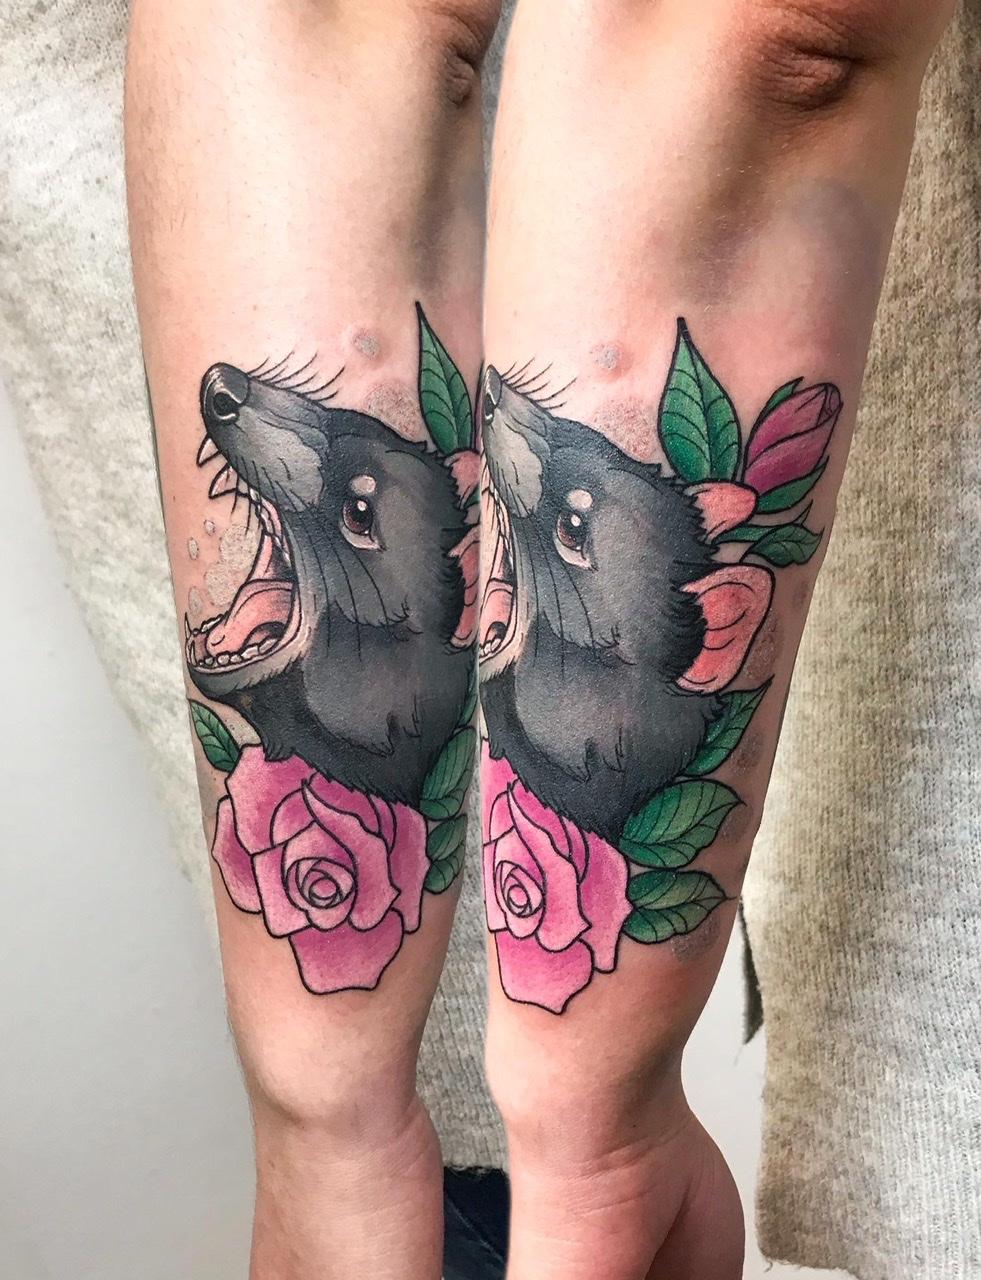 Inksearch tattoo Iza Bagińska